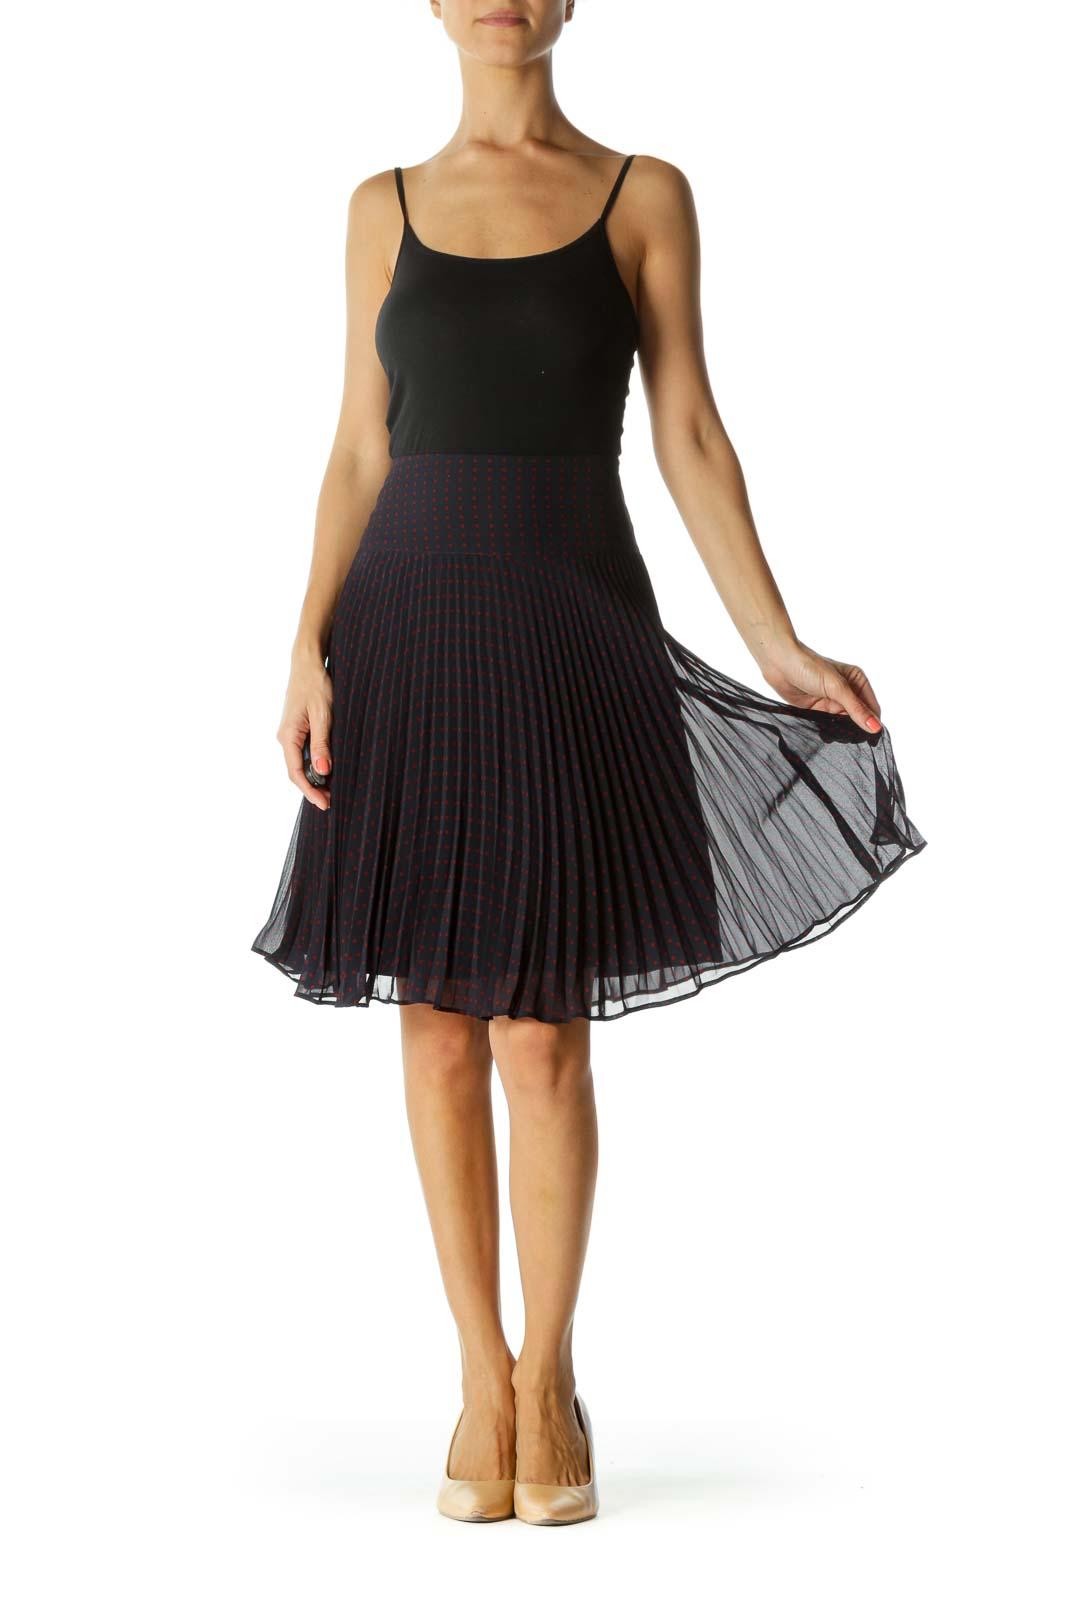 Burgundy and Navy Polka-Dot Pleated Skirt